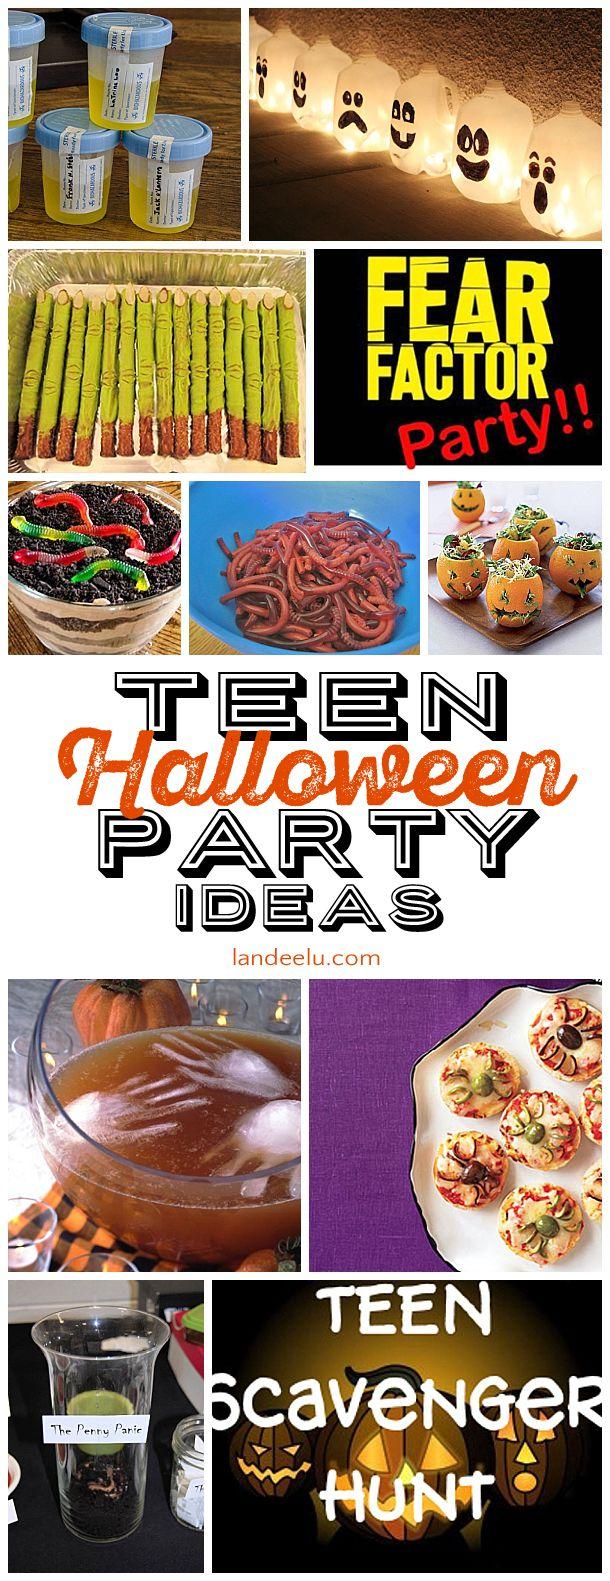 25+ best Halloween Party Tweens ideas on Pinterest | Scary movie 1 ...